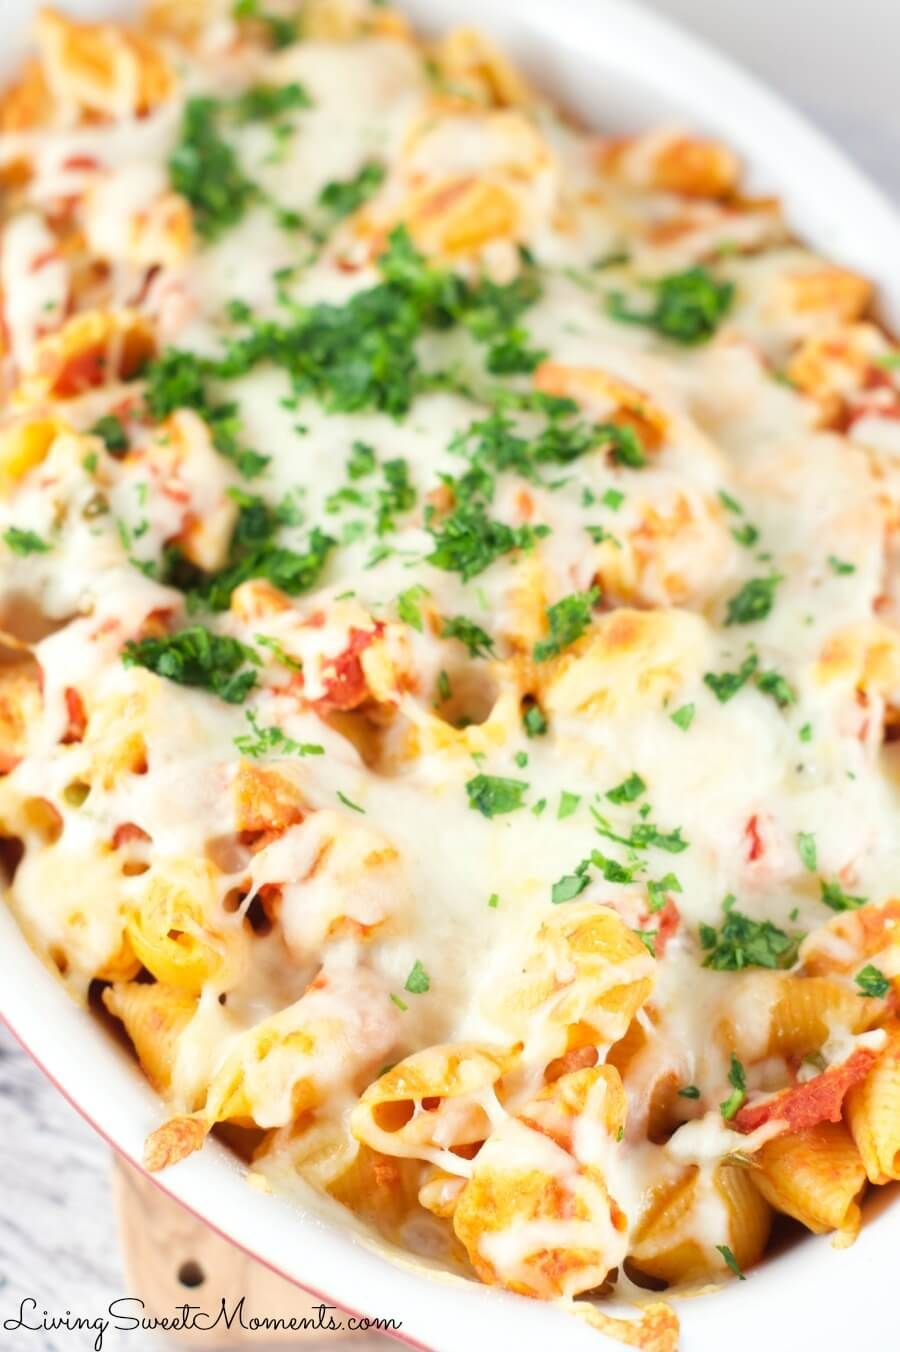 Chicken Casserole Recipes For Dinner